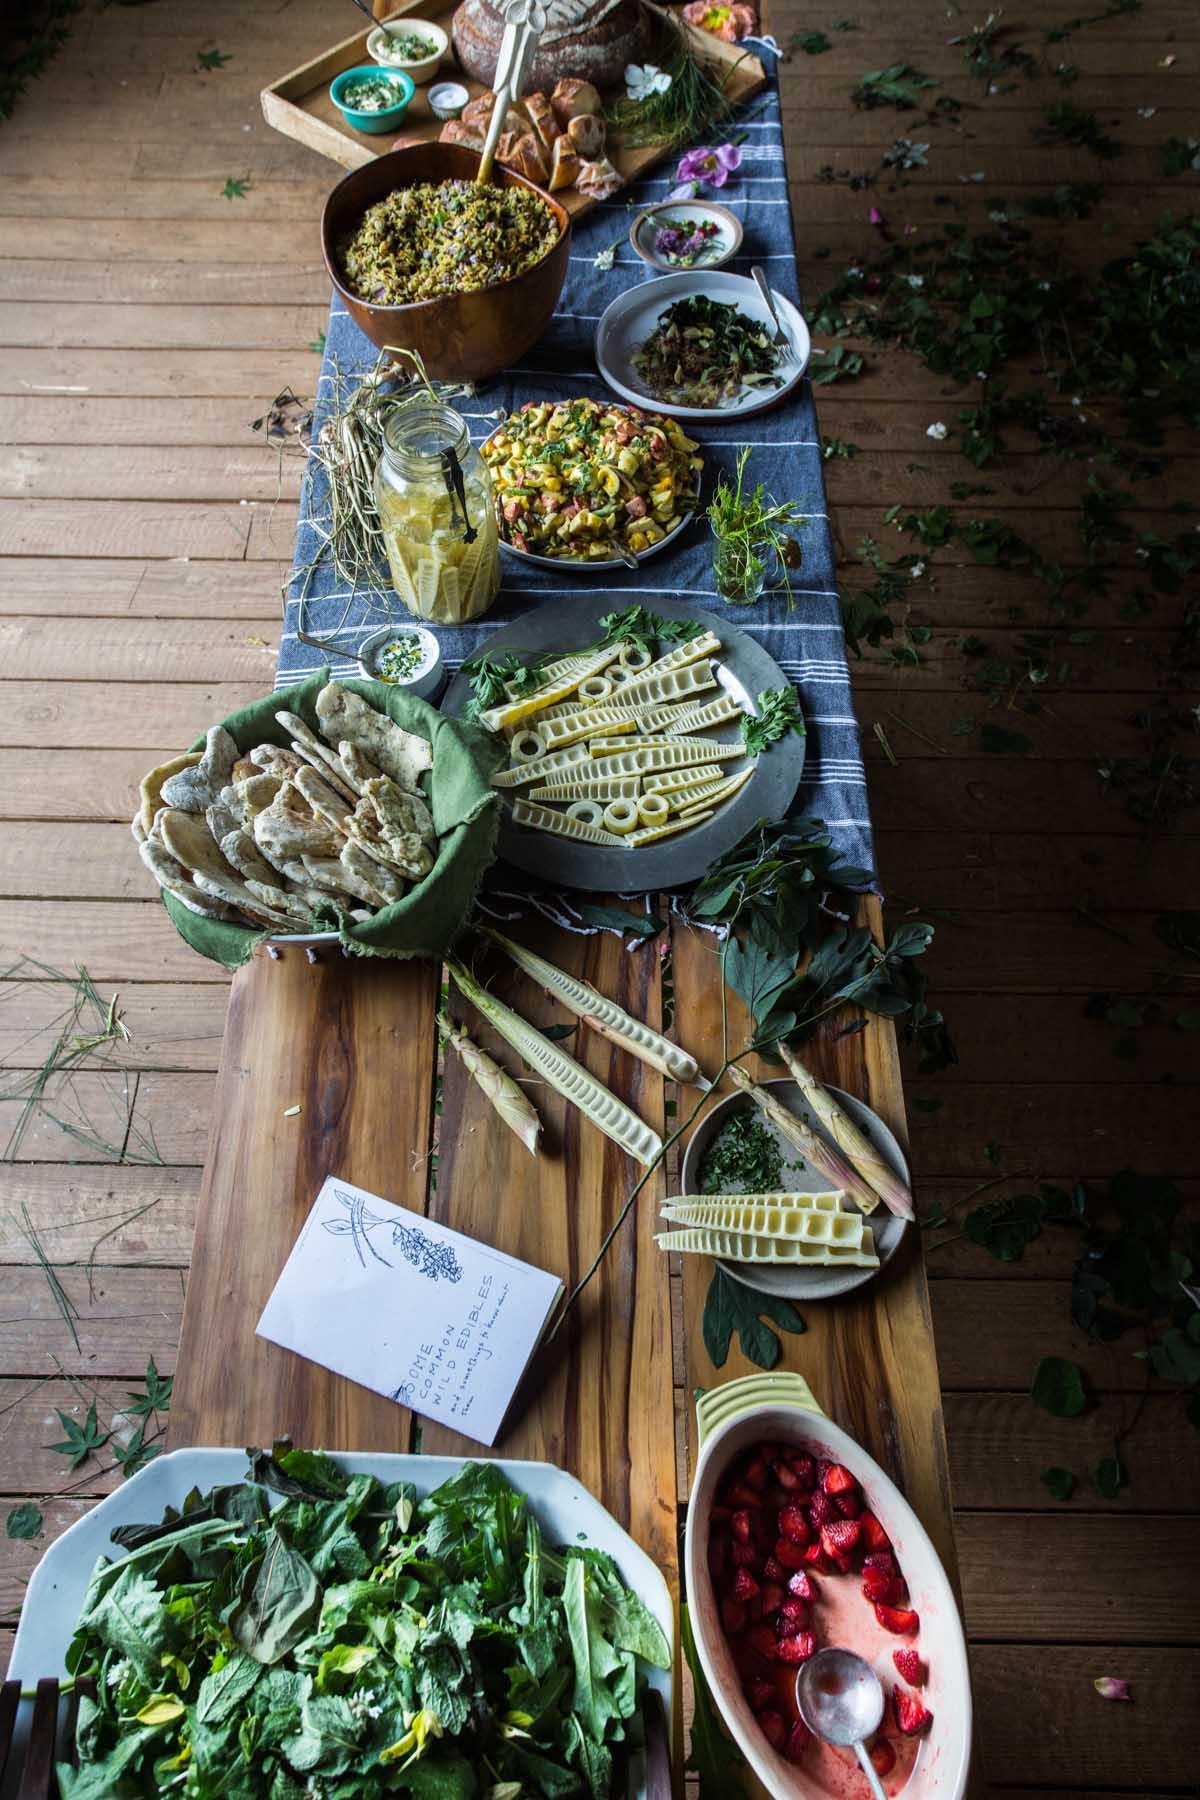 RA_spring beauty day_food_wild food-201604306861.jpg